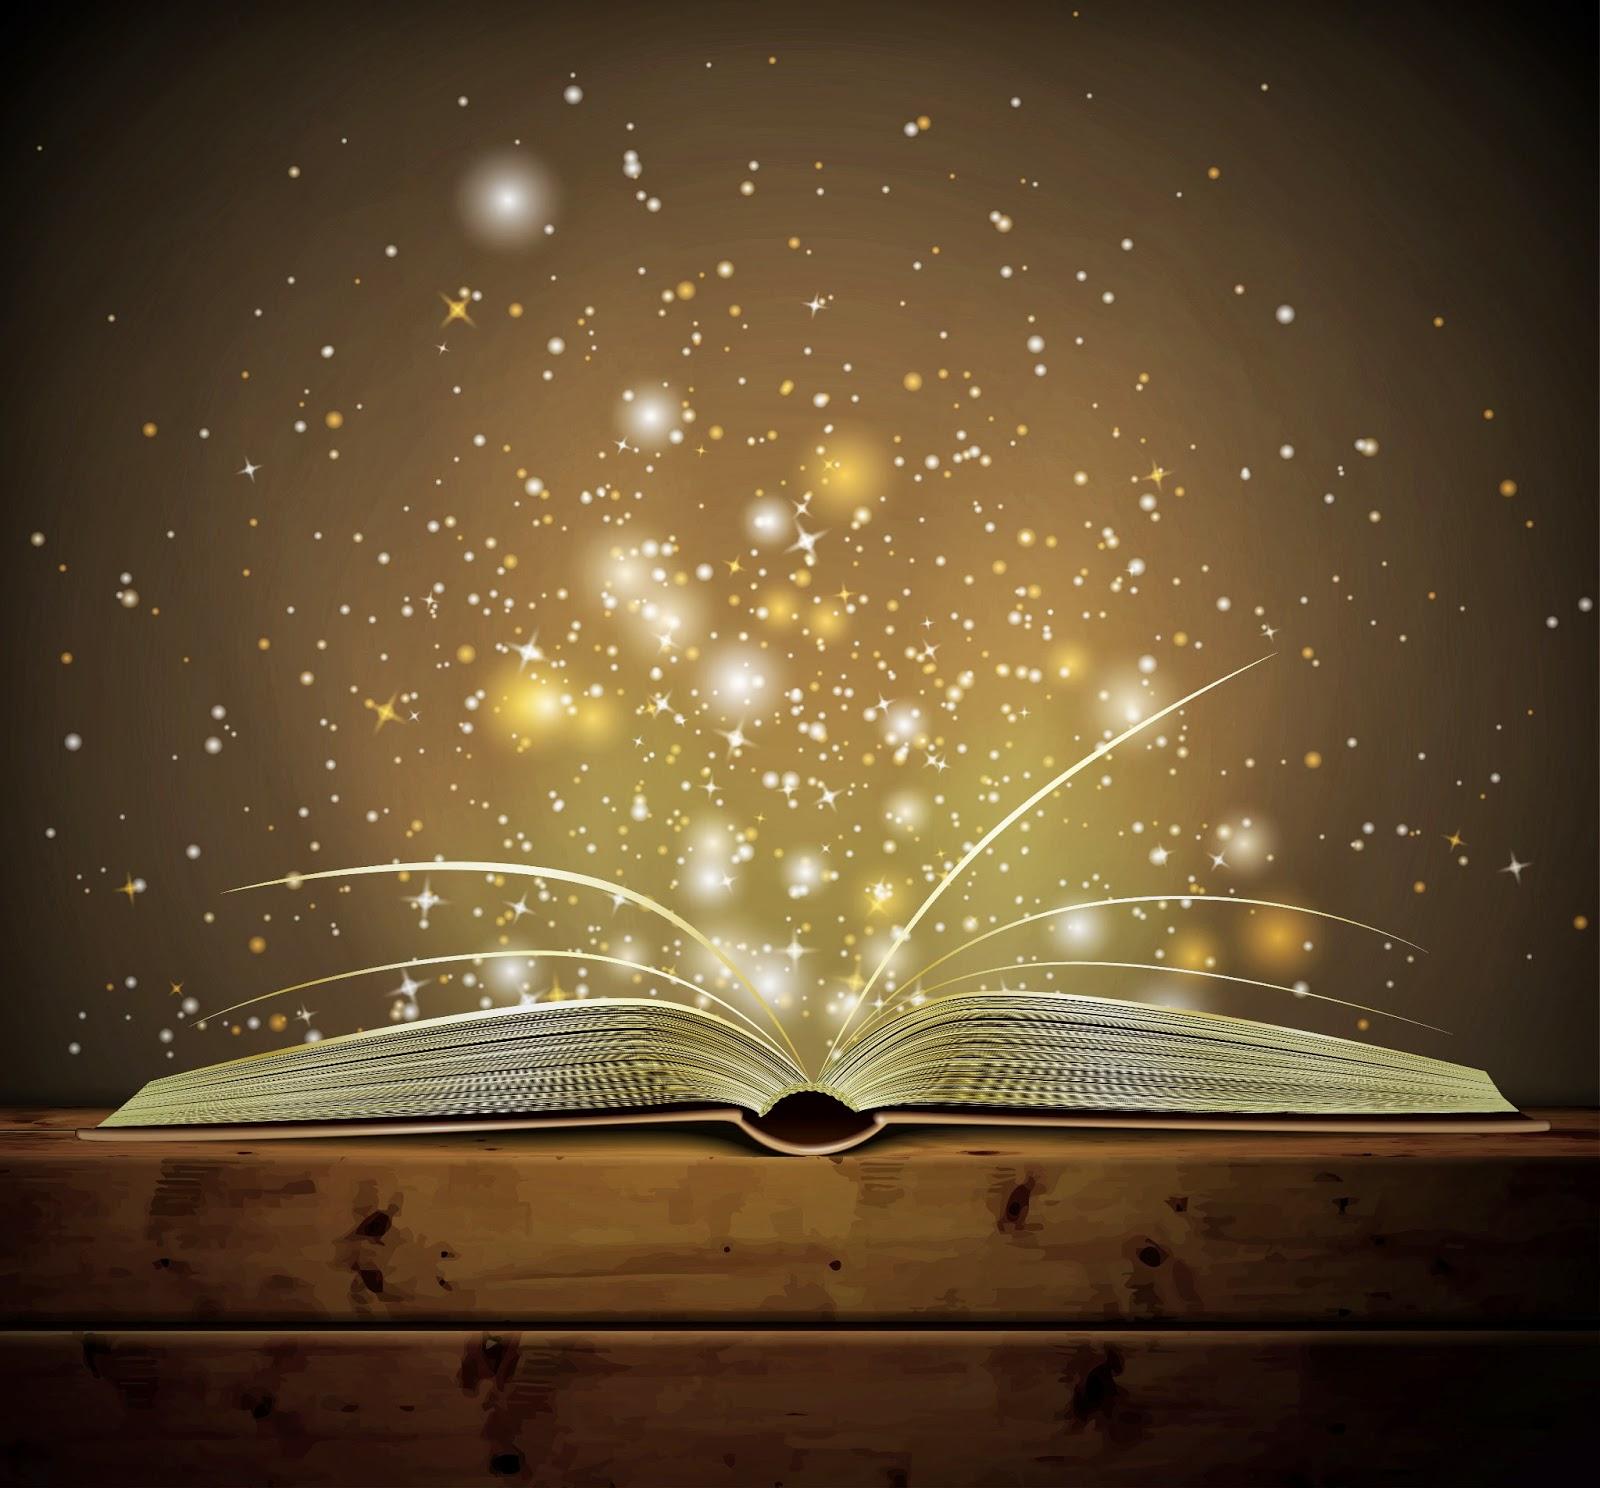 book-magic-1   Byford's Books